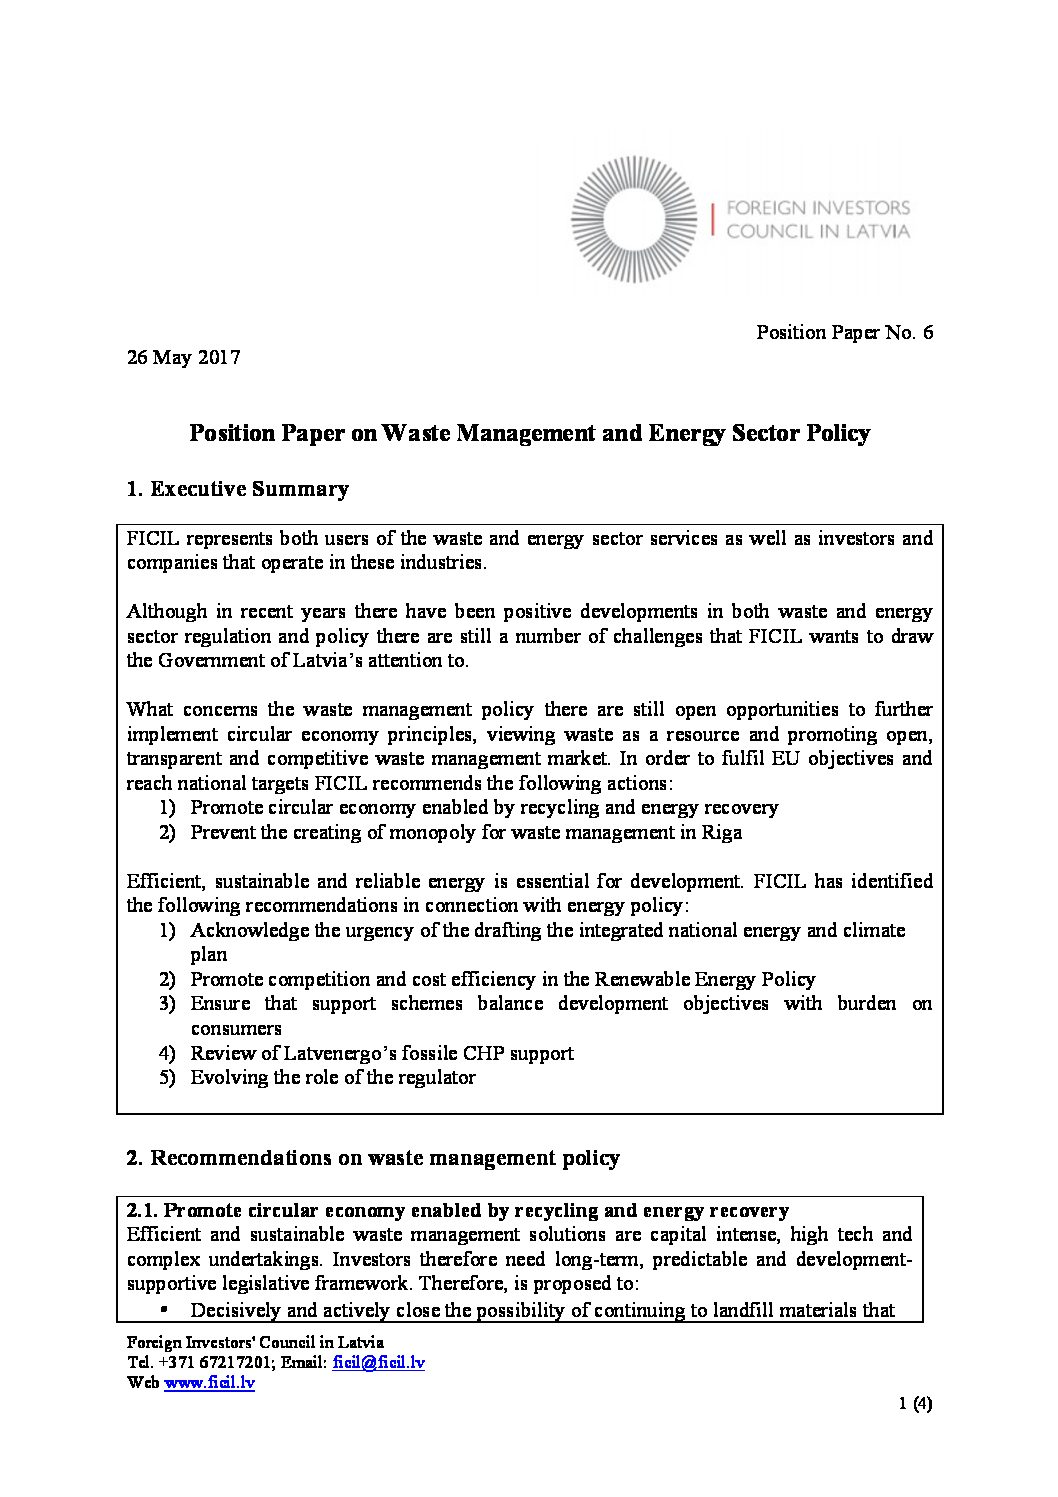 EnergyWaste_EN - FICIL Foreign Investors Council in Latvia